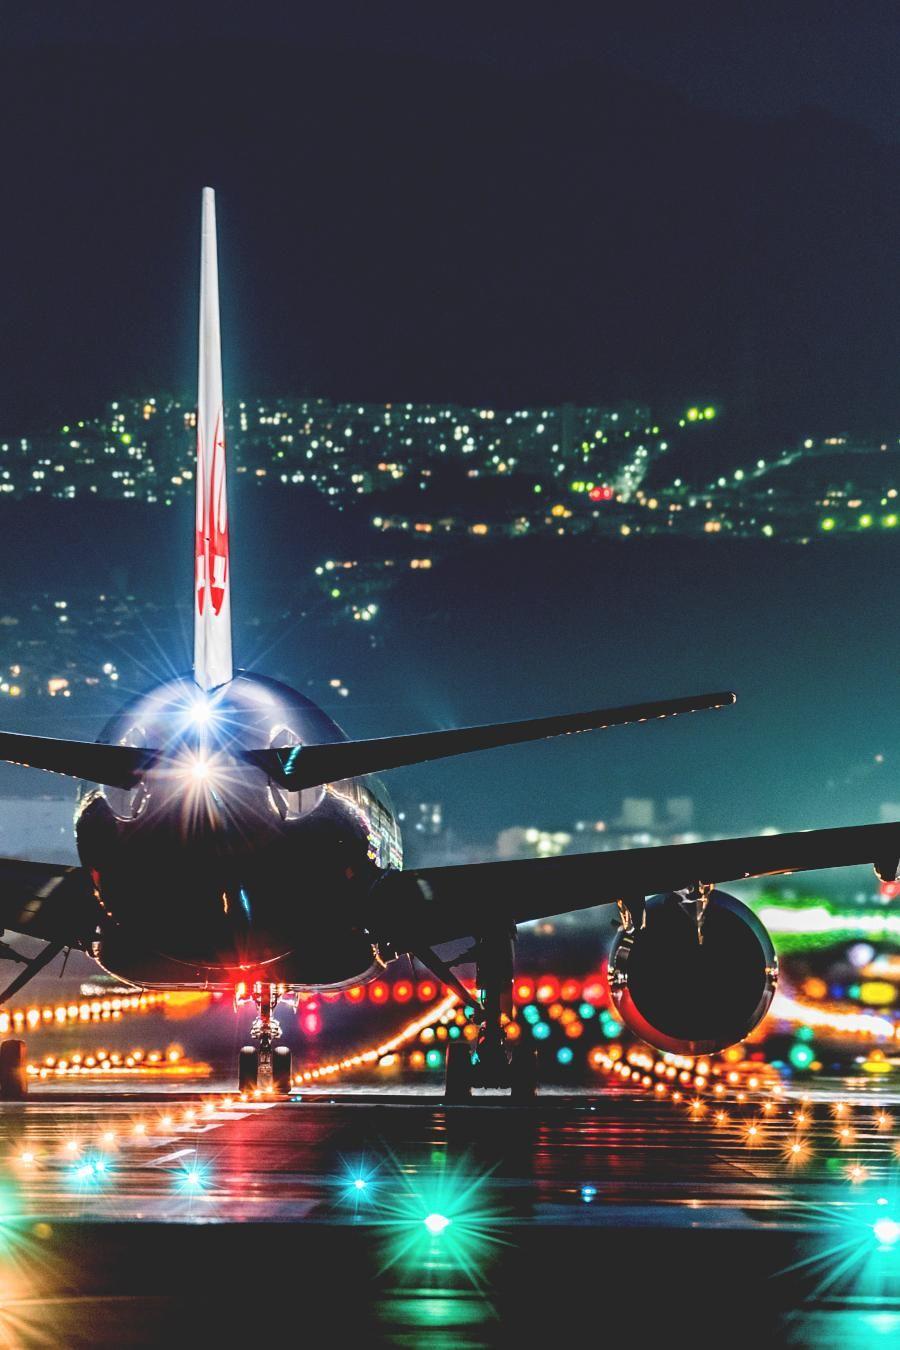 Flight Night Airport Airstrip Lights Boeing Airbus Jpg 900 1350